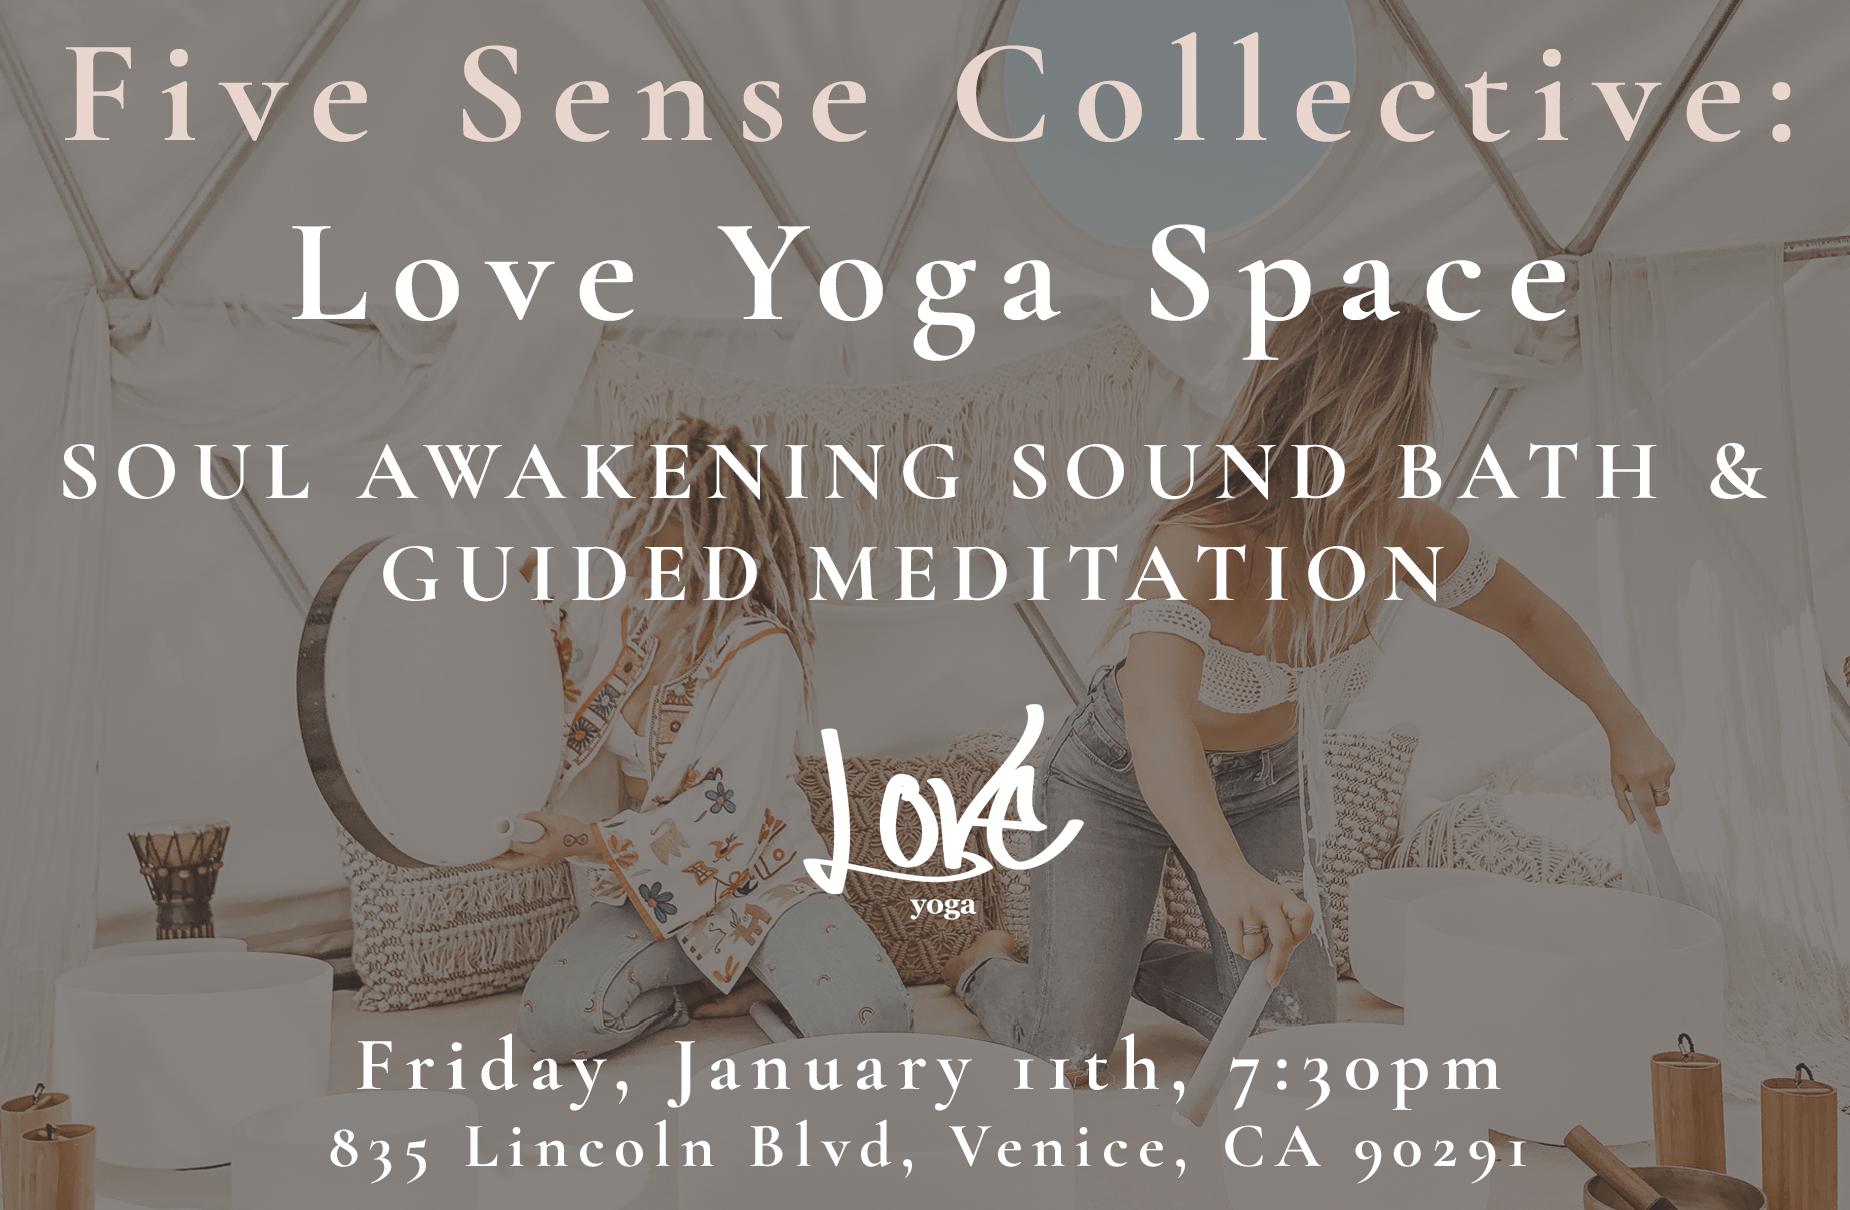 LOVE YOGA SPACE FIVE SENSE COLLECTIVE JAN 11TH 2019.png